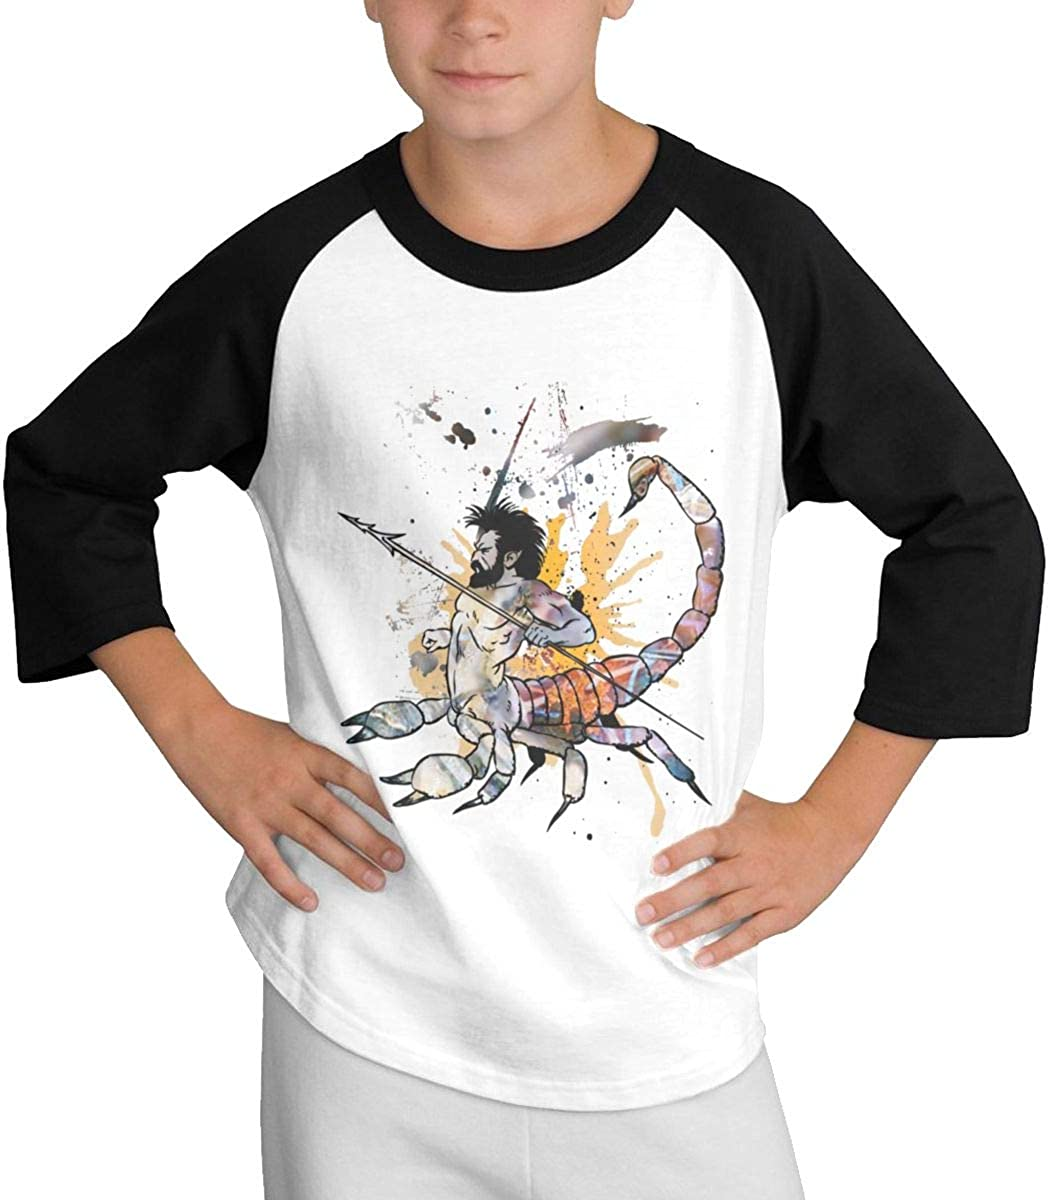 Qiop Nee Scorpio Man Doodle Raglan 3//4 Short-Sleeve T-Shirts Youth Girls Boys